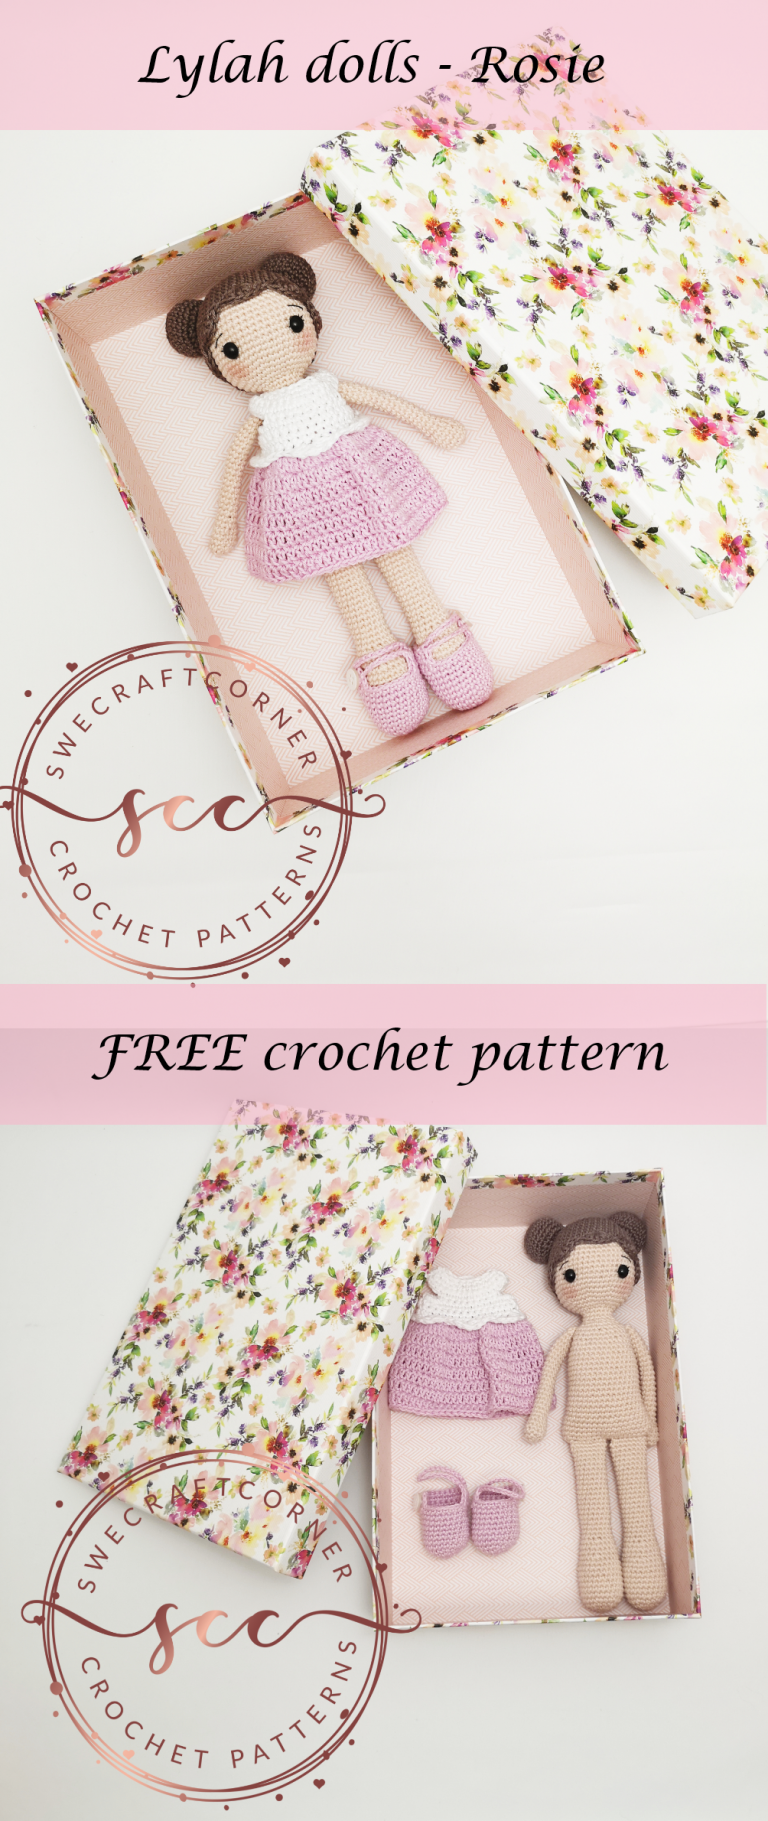 Lylah doll – Rosie FREE pattern – Swecraftcorner #toydoll